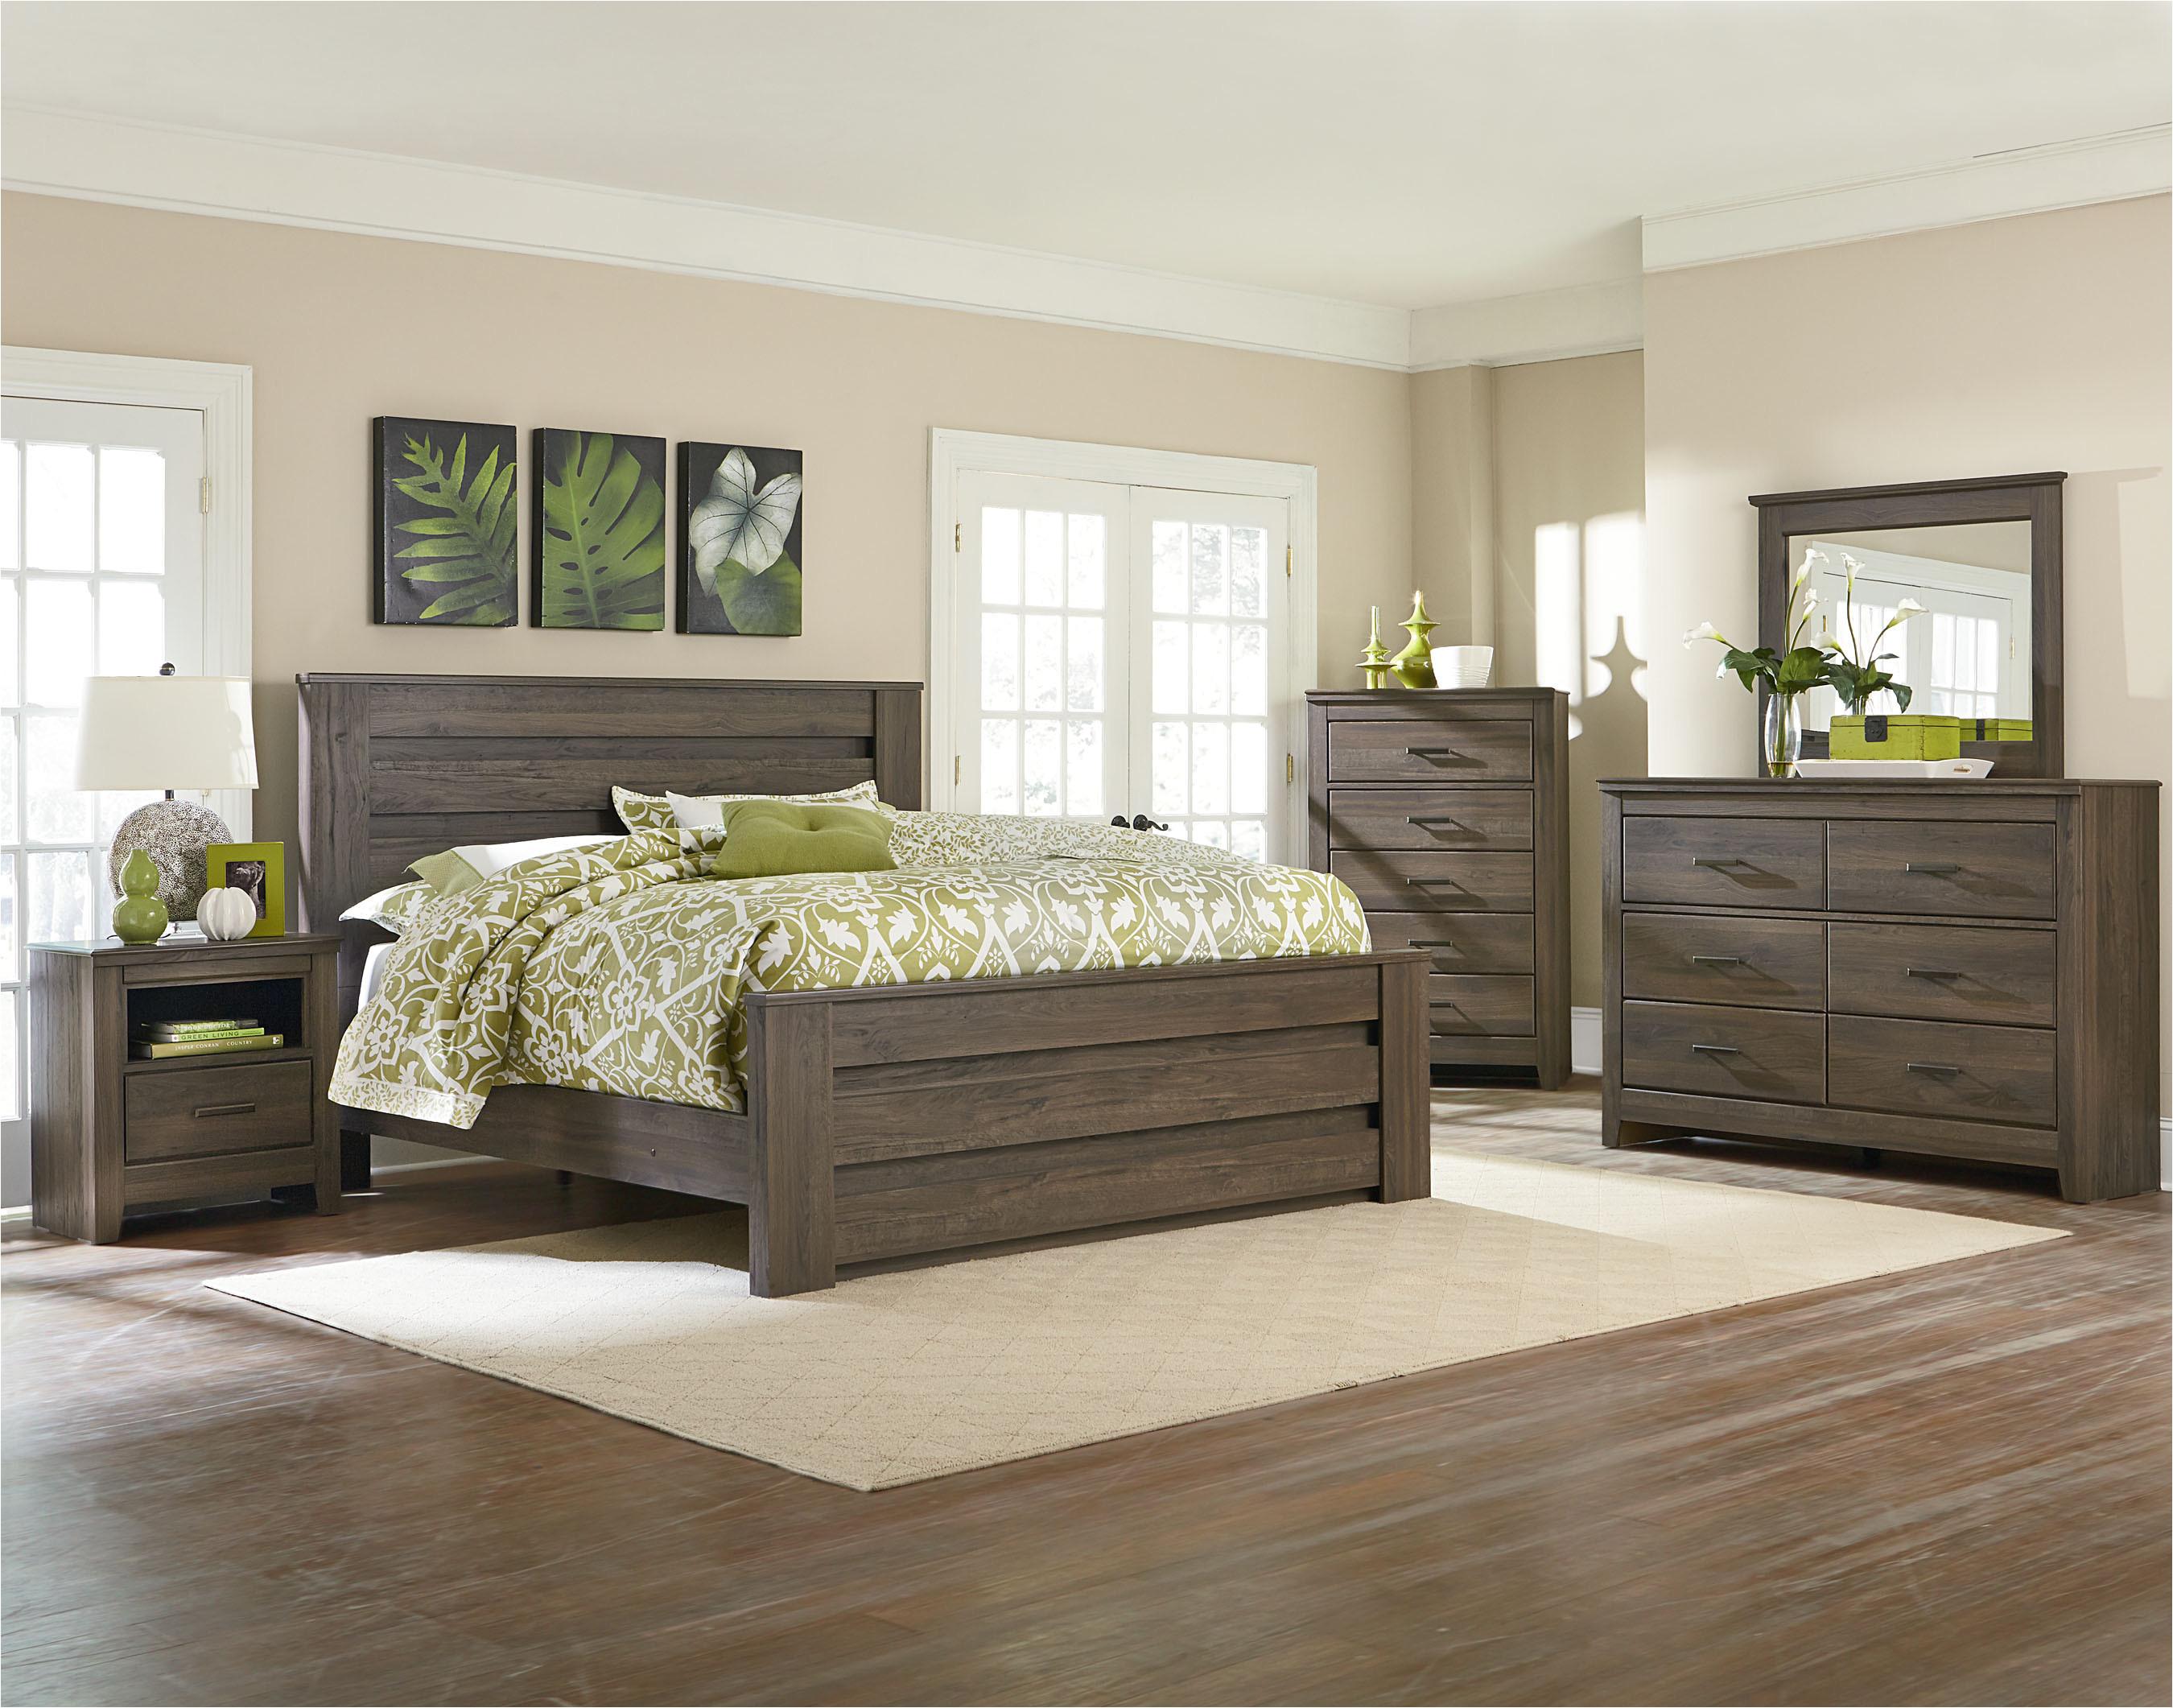 fresh american freight nashville tn furniture part 256